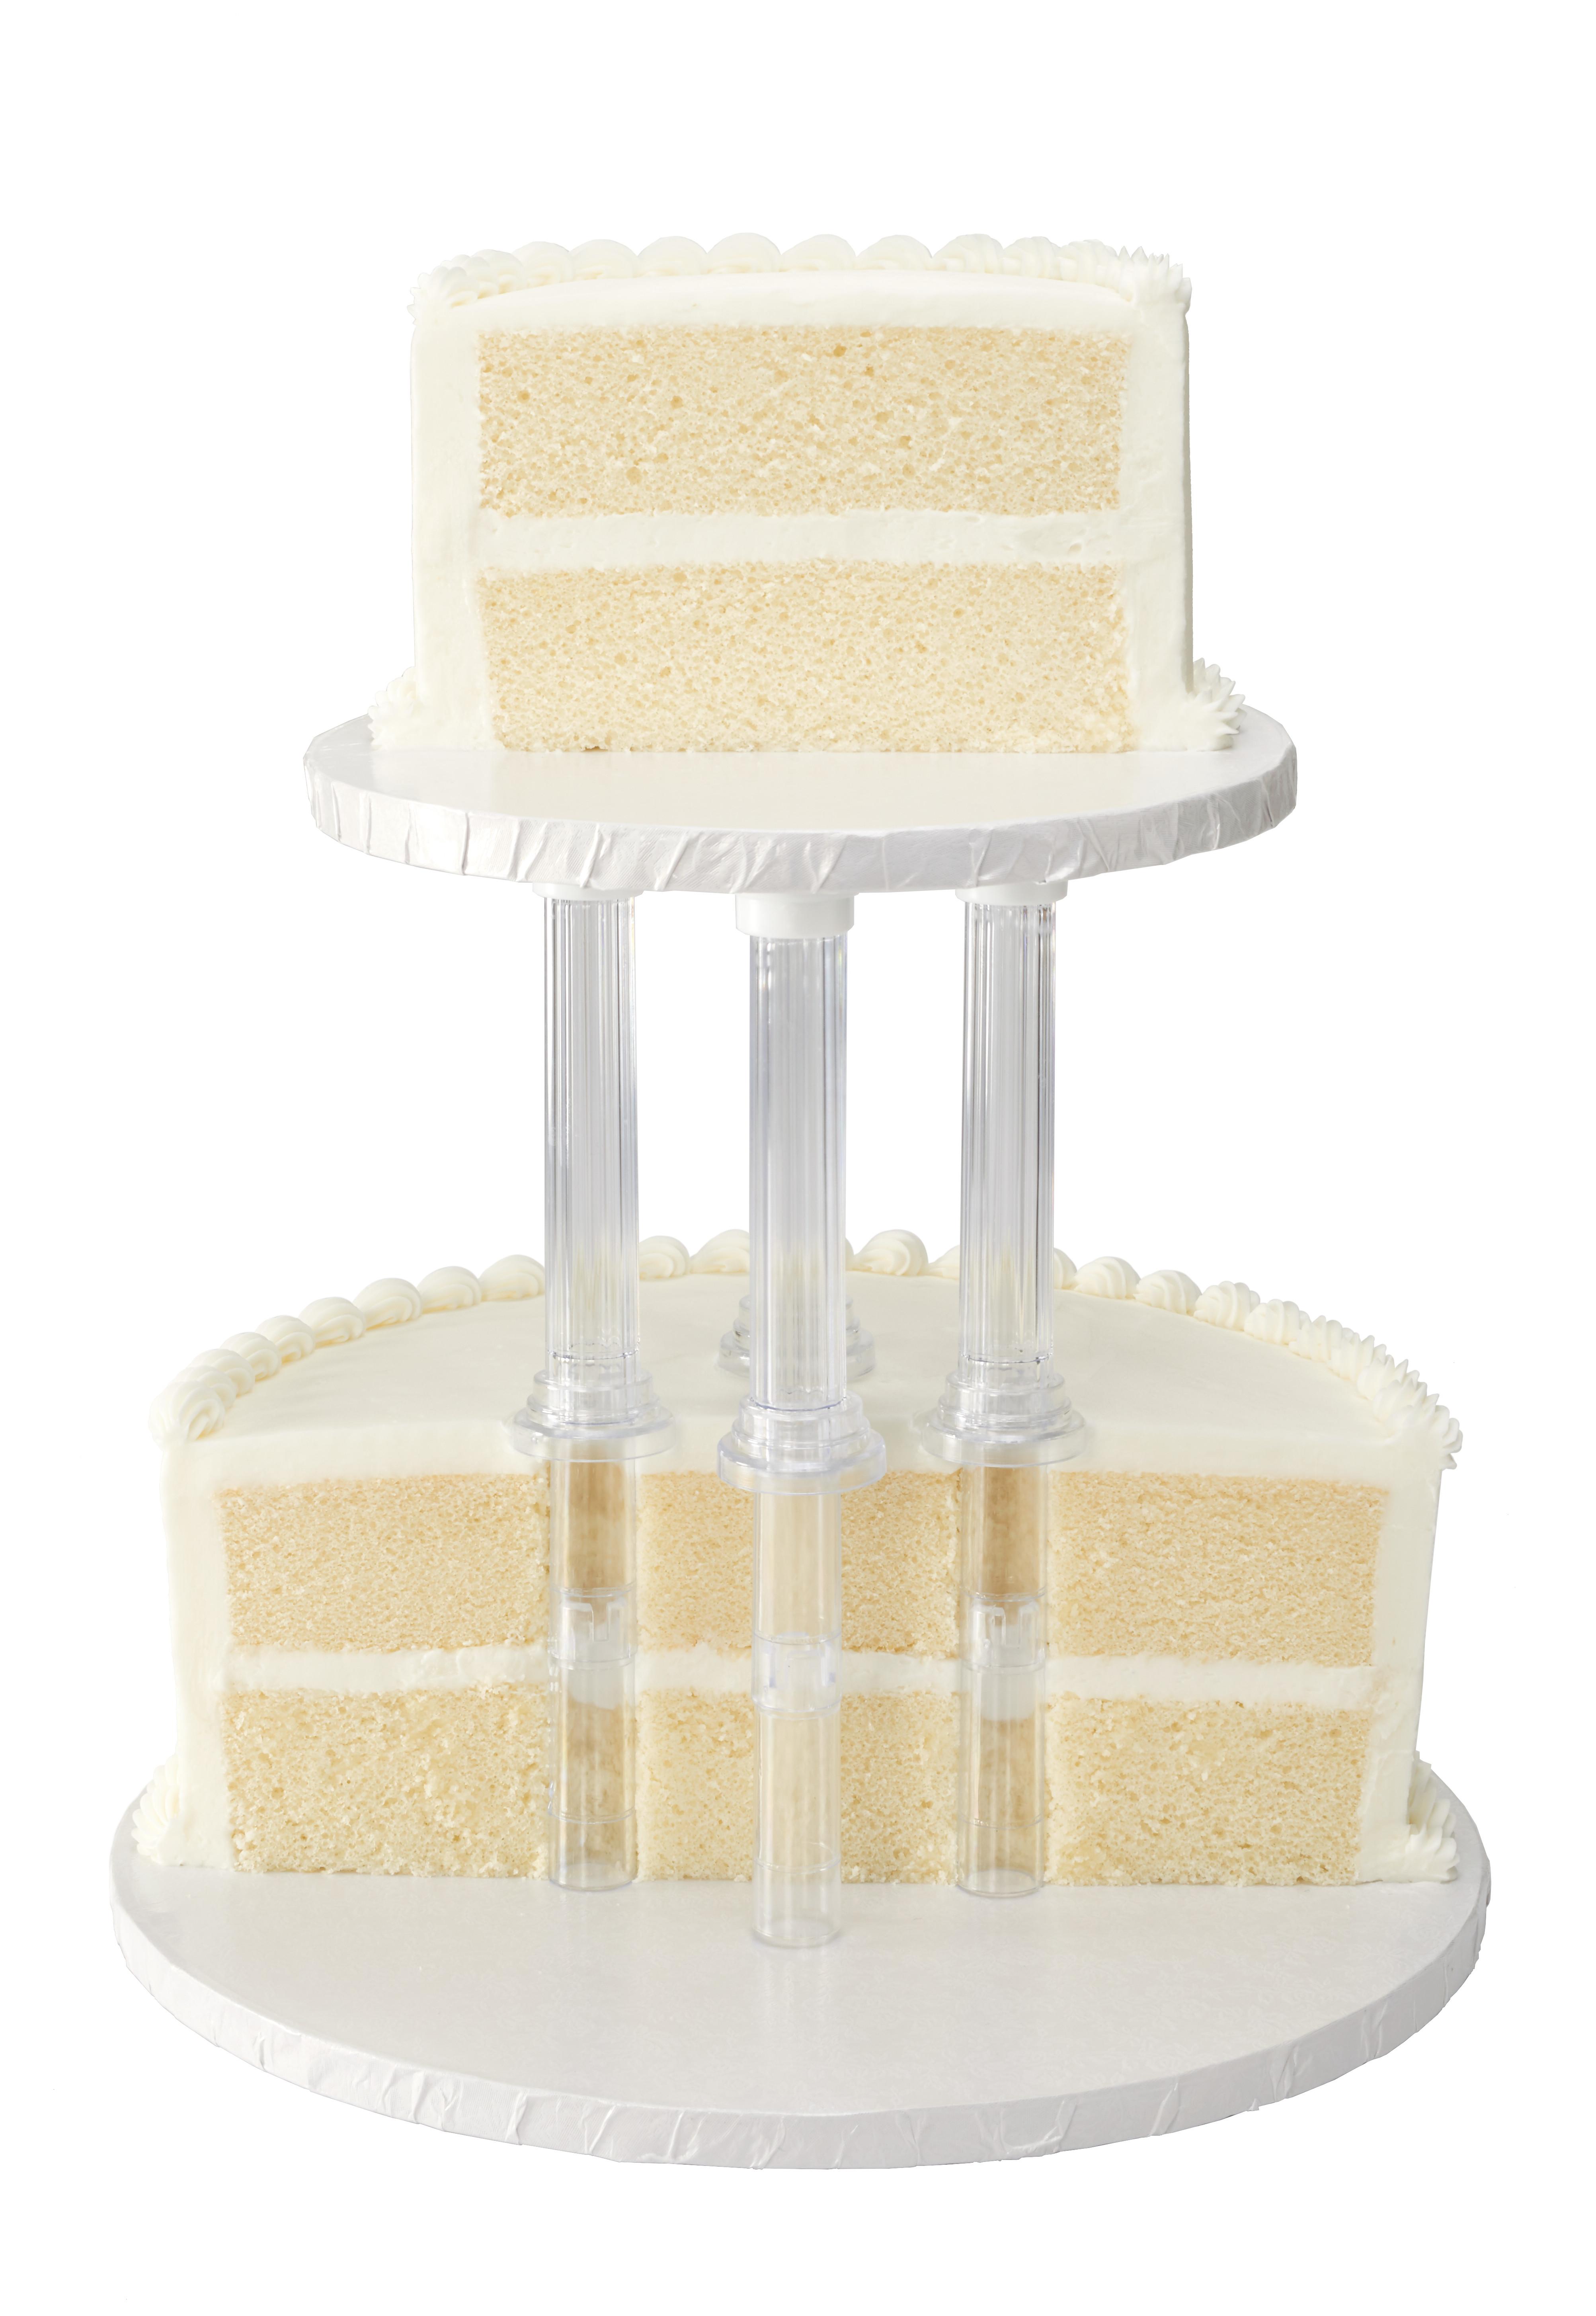 Separated 2 Tier Round 6 Quot Amp 10 Quot Cake Structure Set Decopac